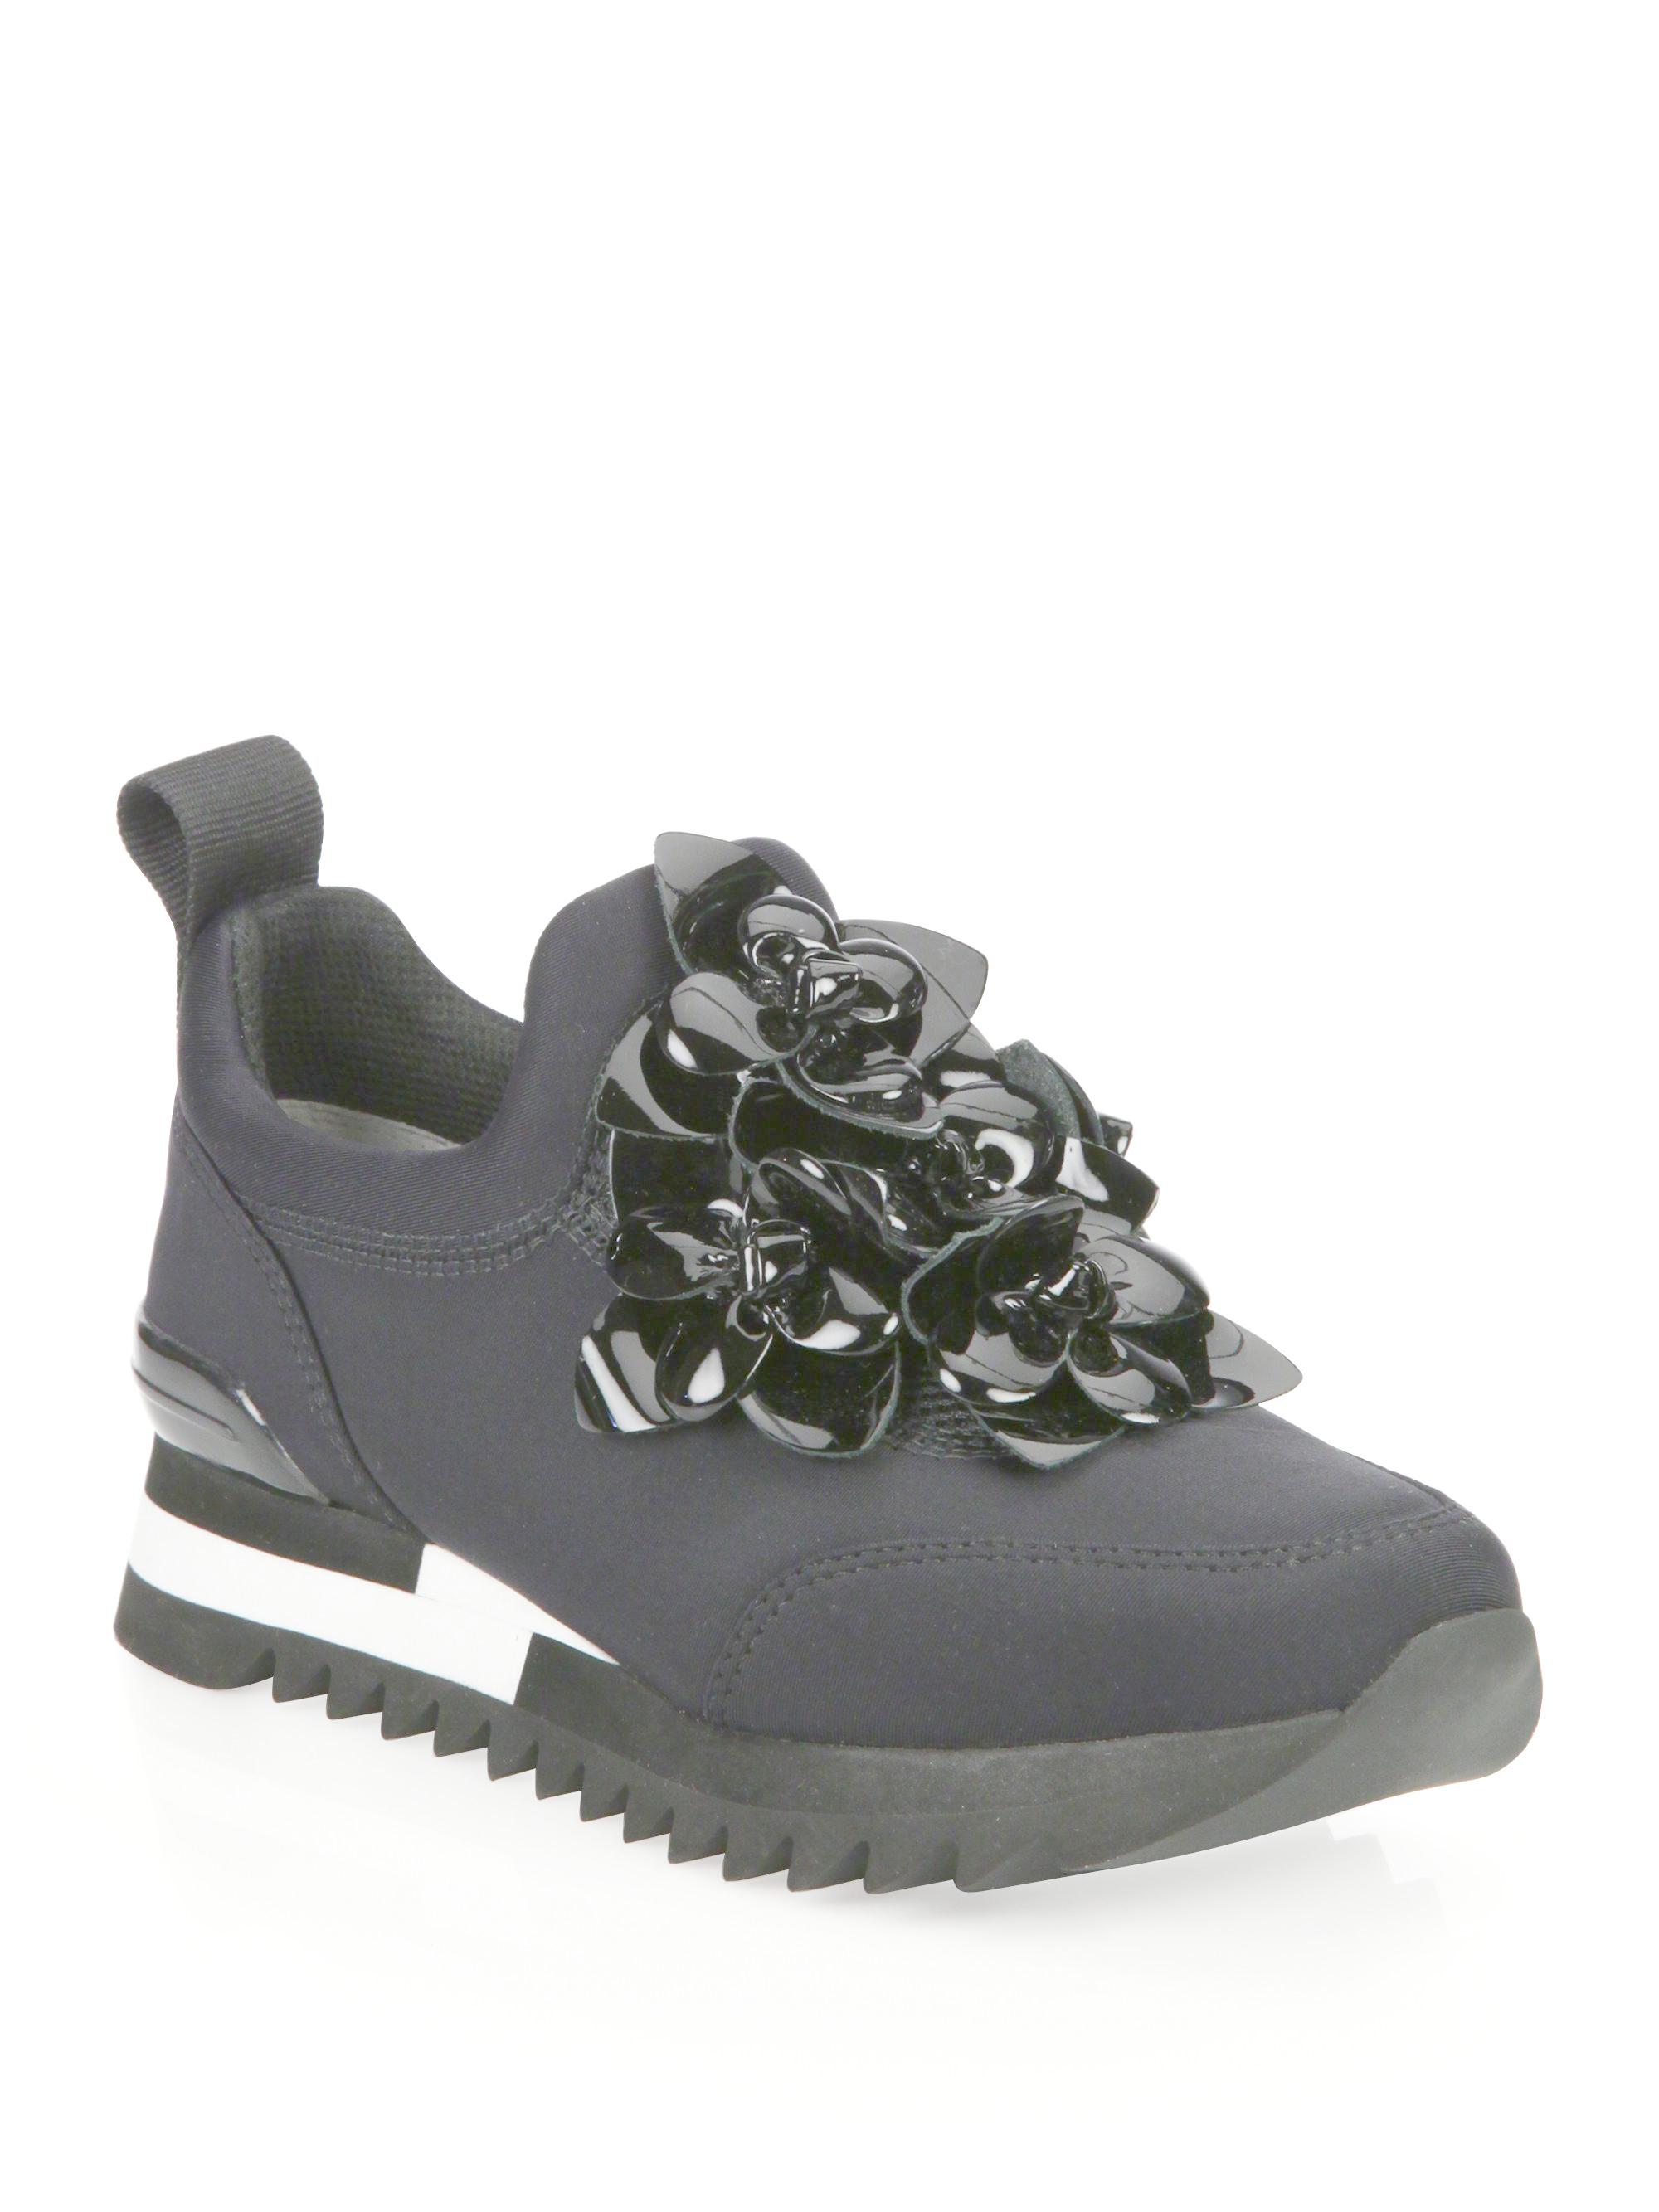 7160a0636b16 Lyst - Tory Burch Blossom Neoprene Sneakers in Black